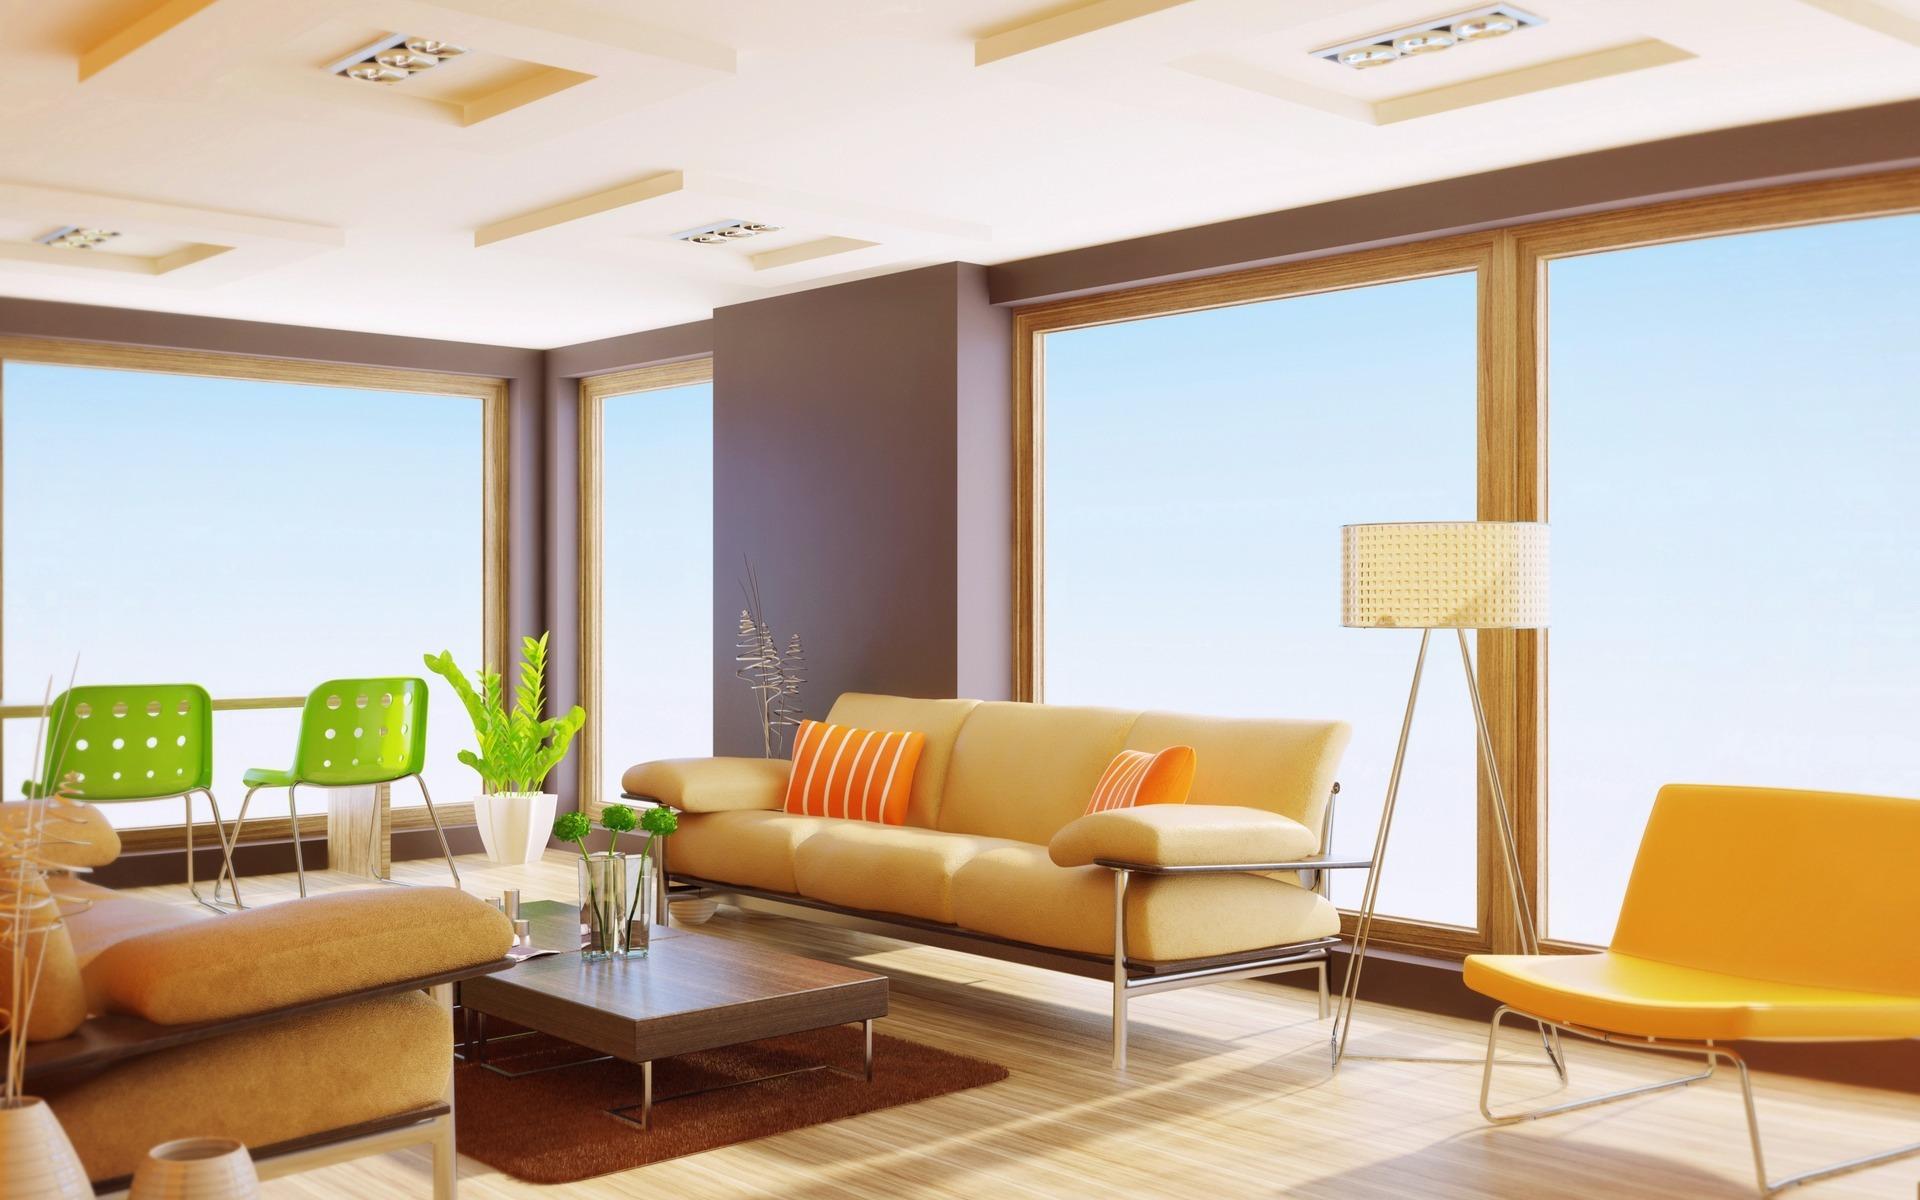 Basic Interior Design For Dummies HomesFeed